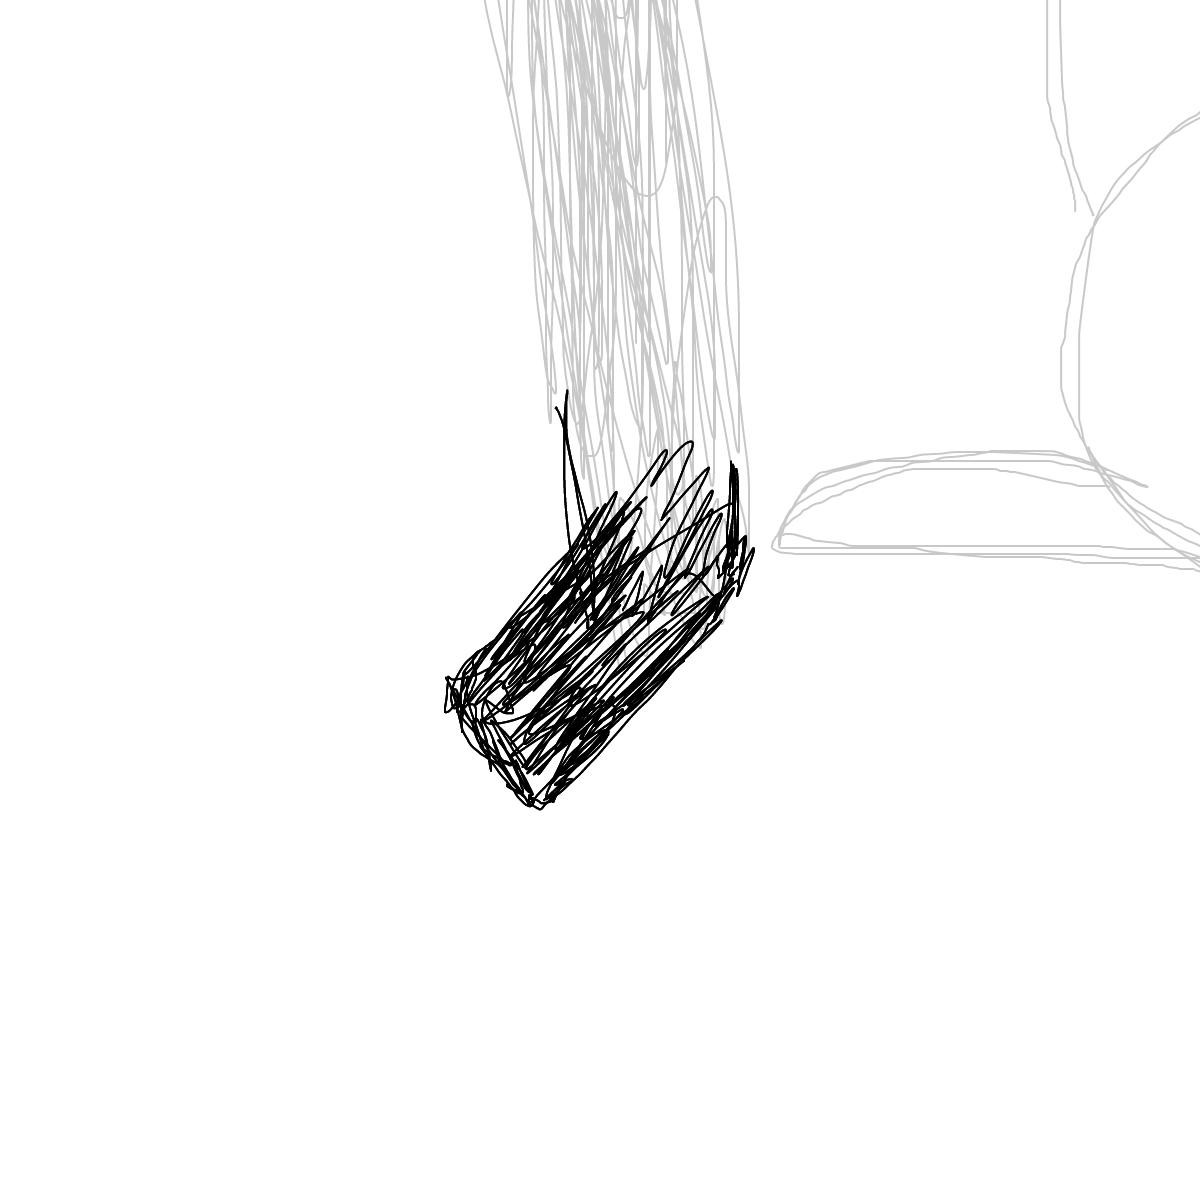 BAAAM drawing#11590 lat:52.4750633239746100lng: 13.4081363677978520